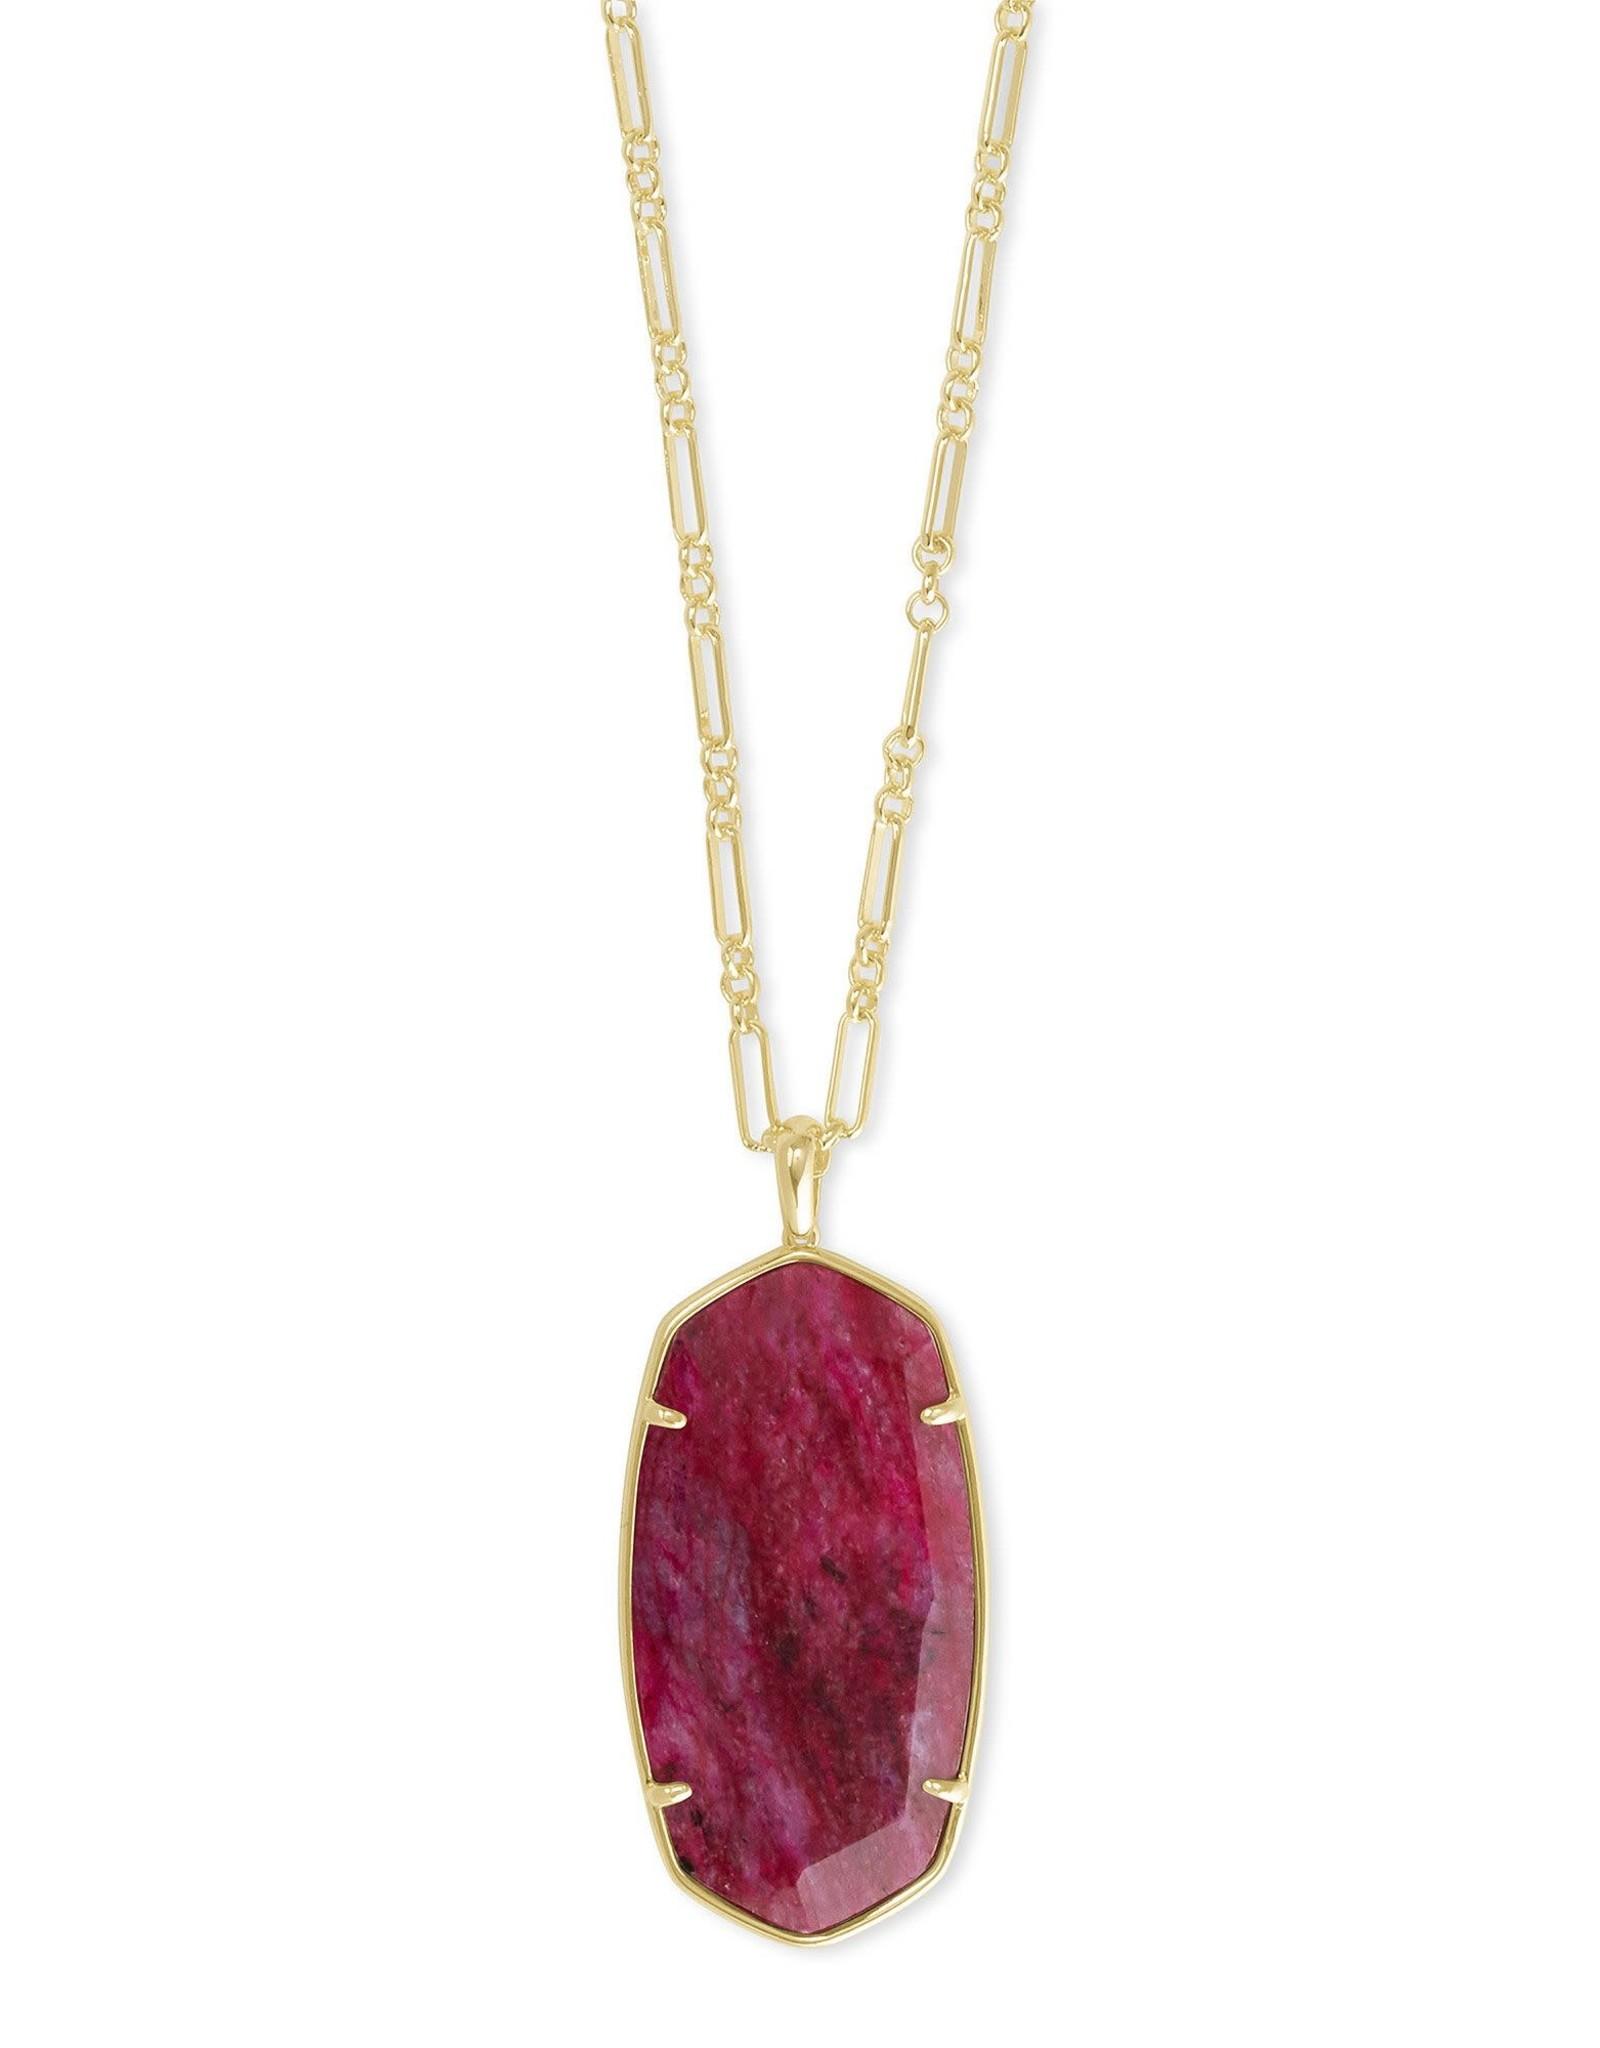 Kendra Scott Faceted Reid Necklace - Raspberry Labradorite/Gold